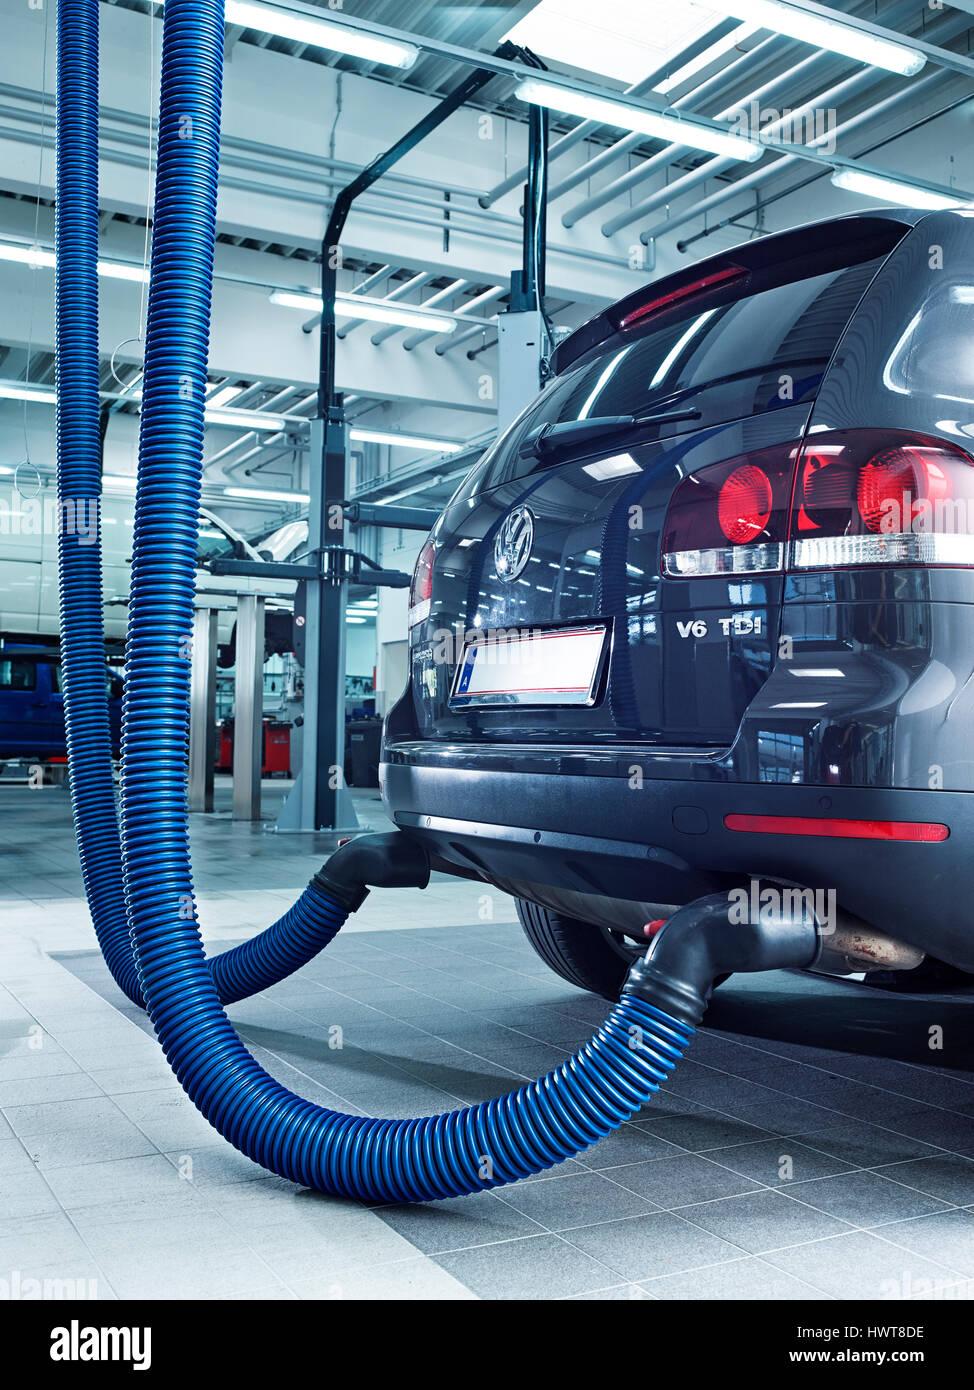 Exhaust emission measurement on car in a VW garage, Austria - Stock Image